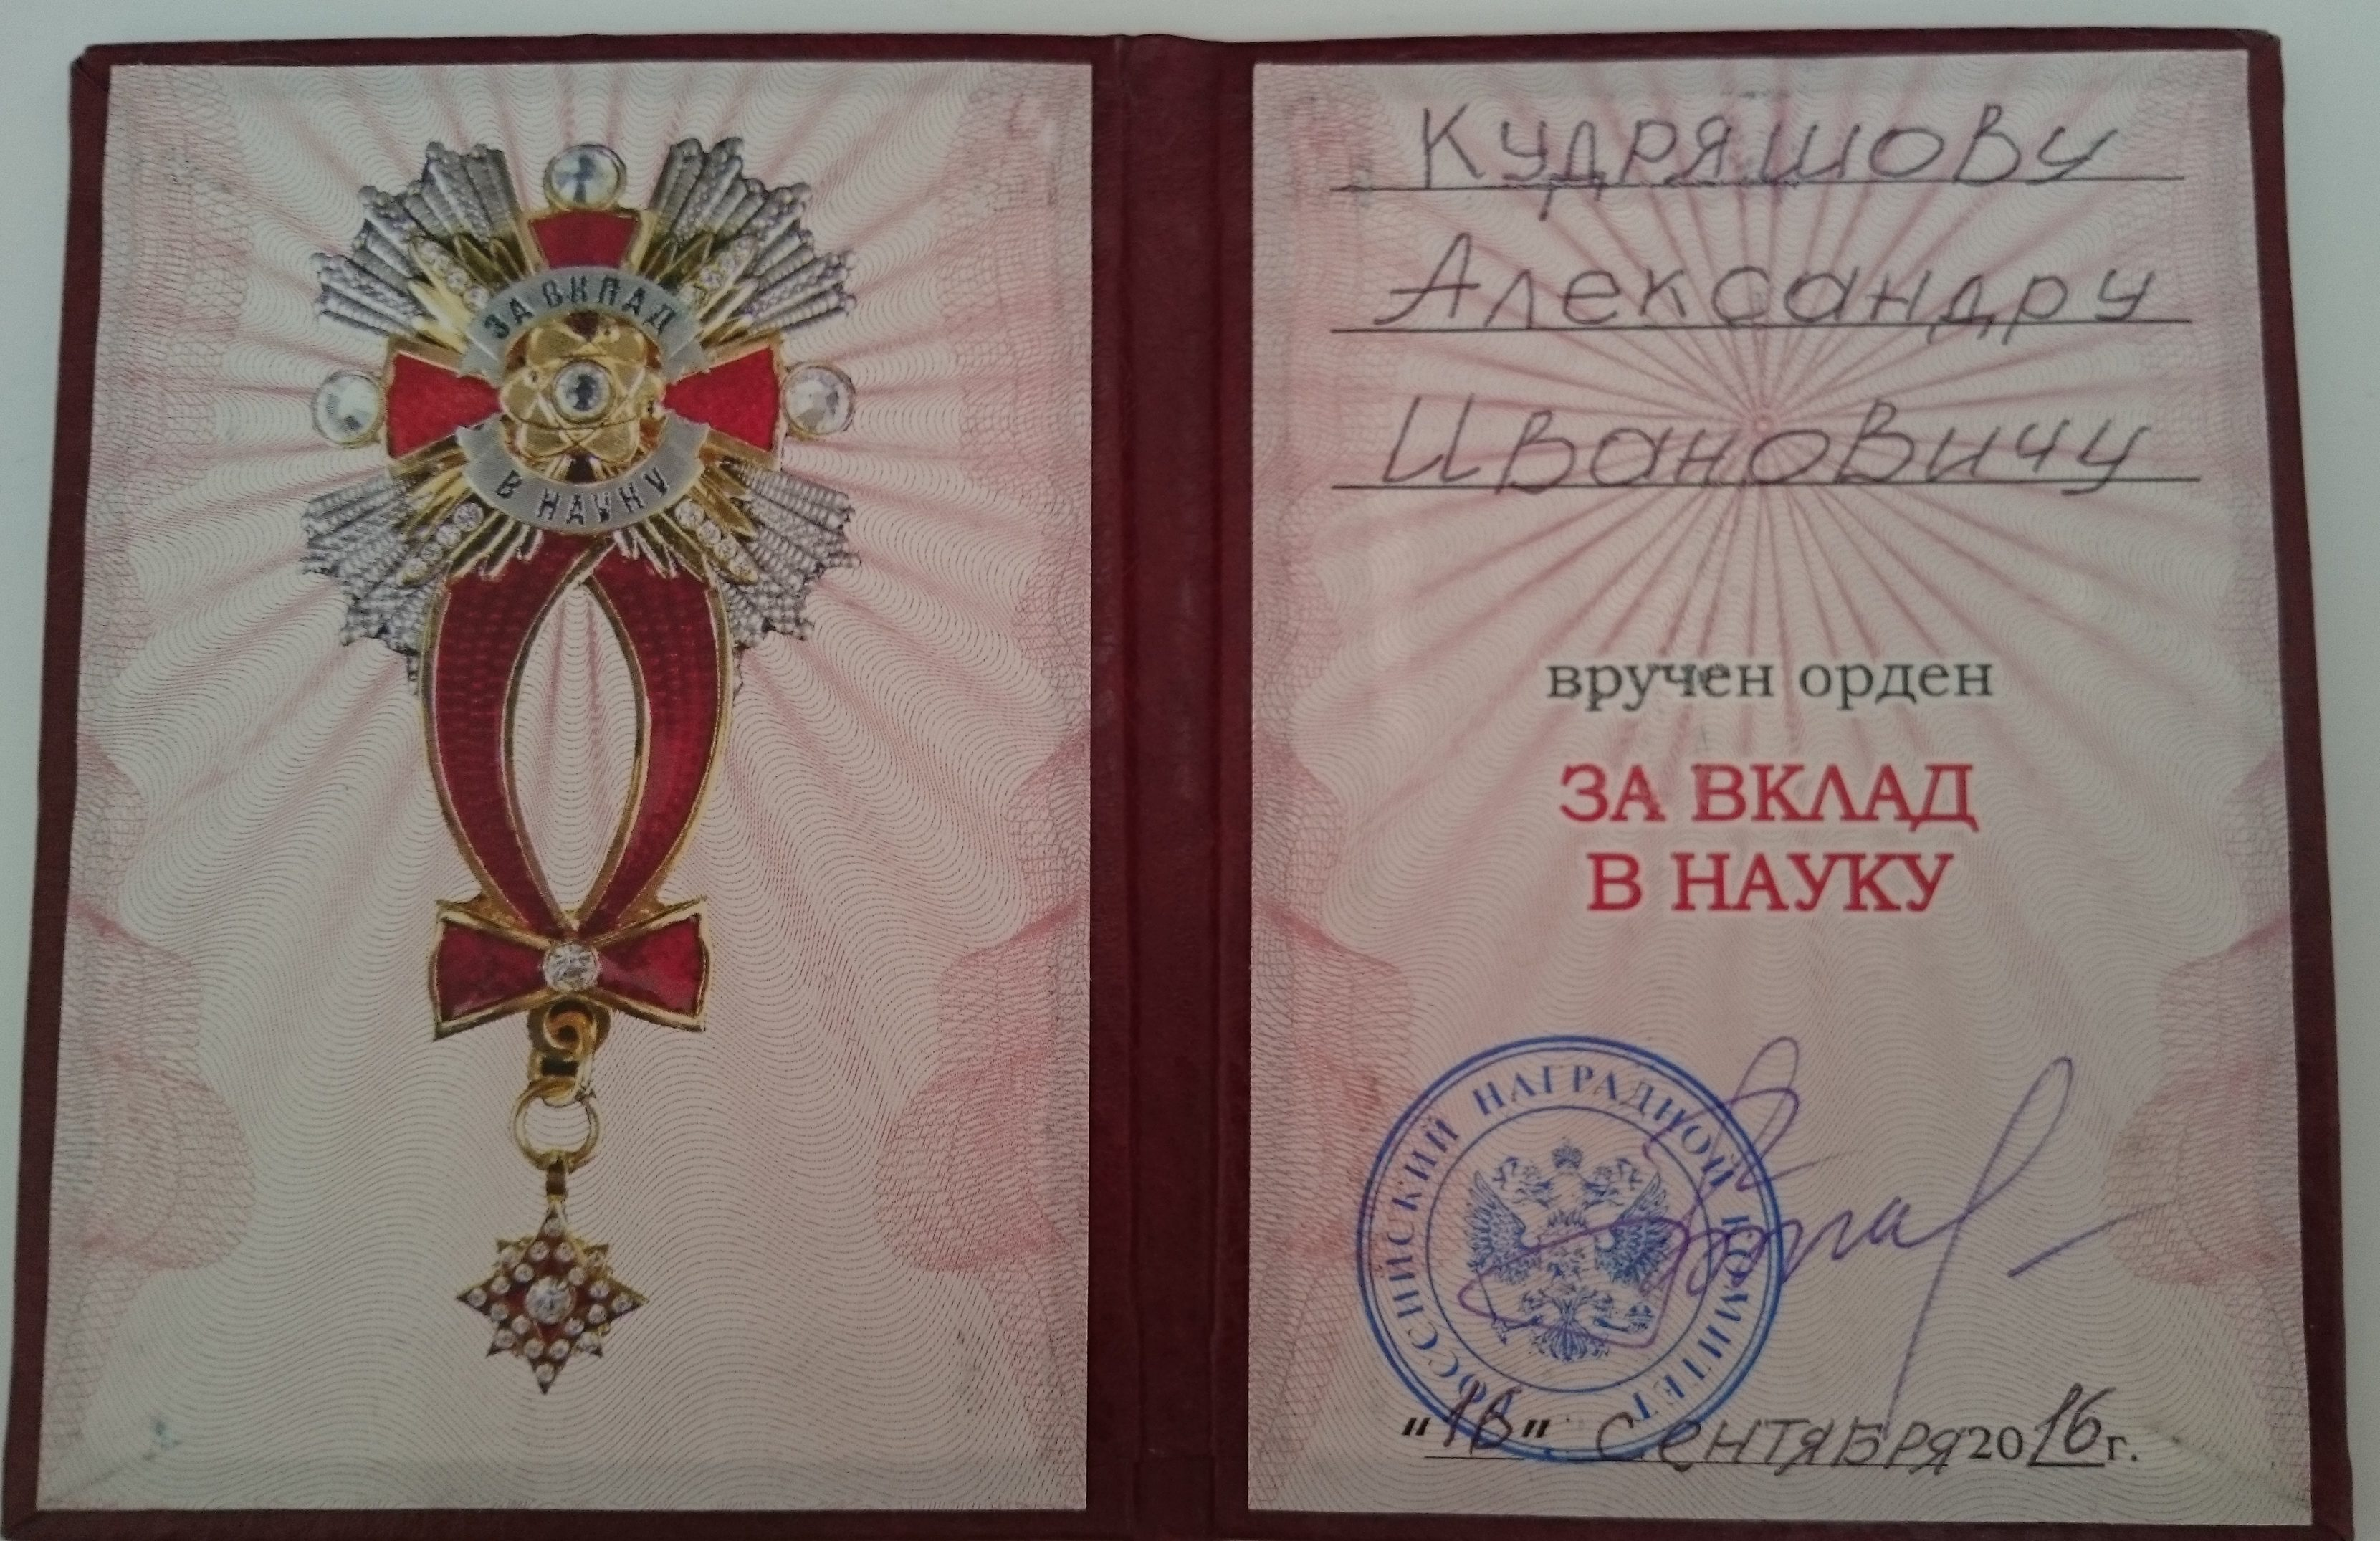 Орден за вклад в науку. Сентябрь 2016г.